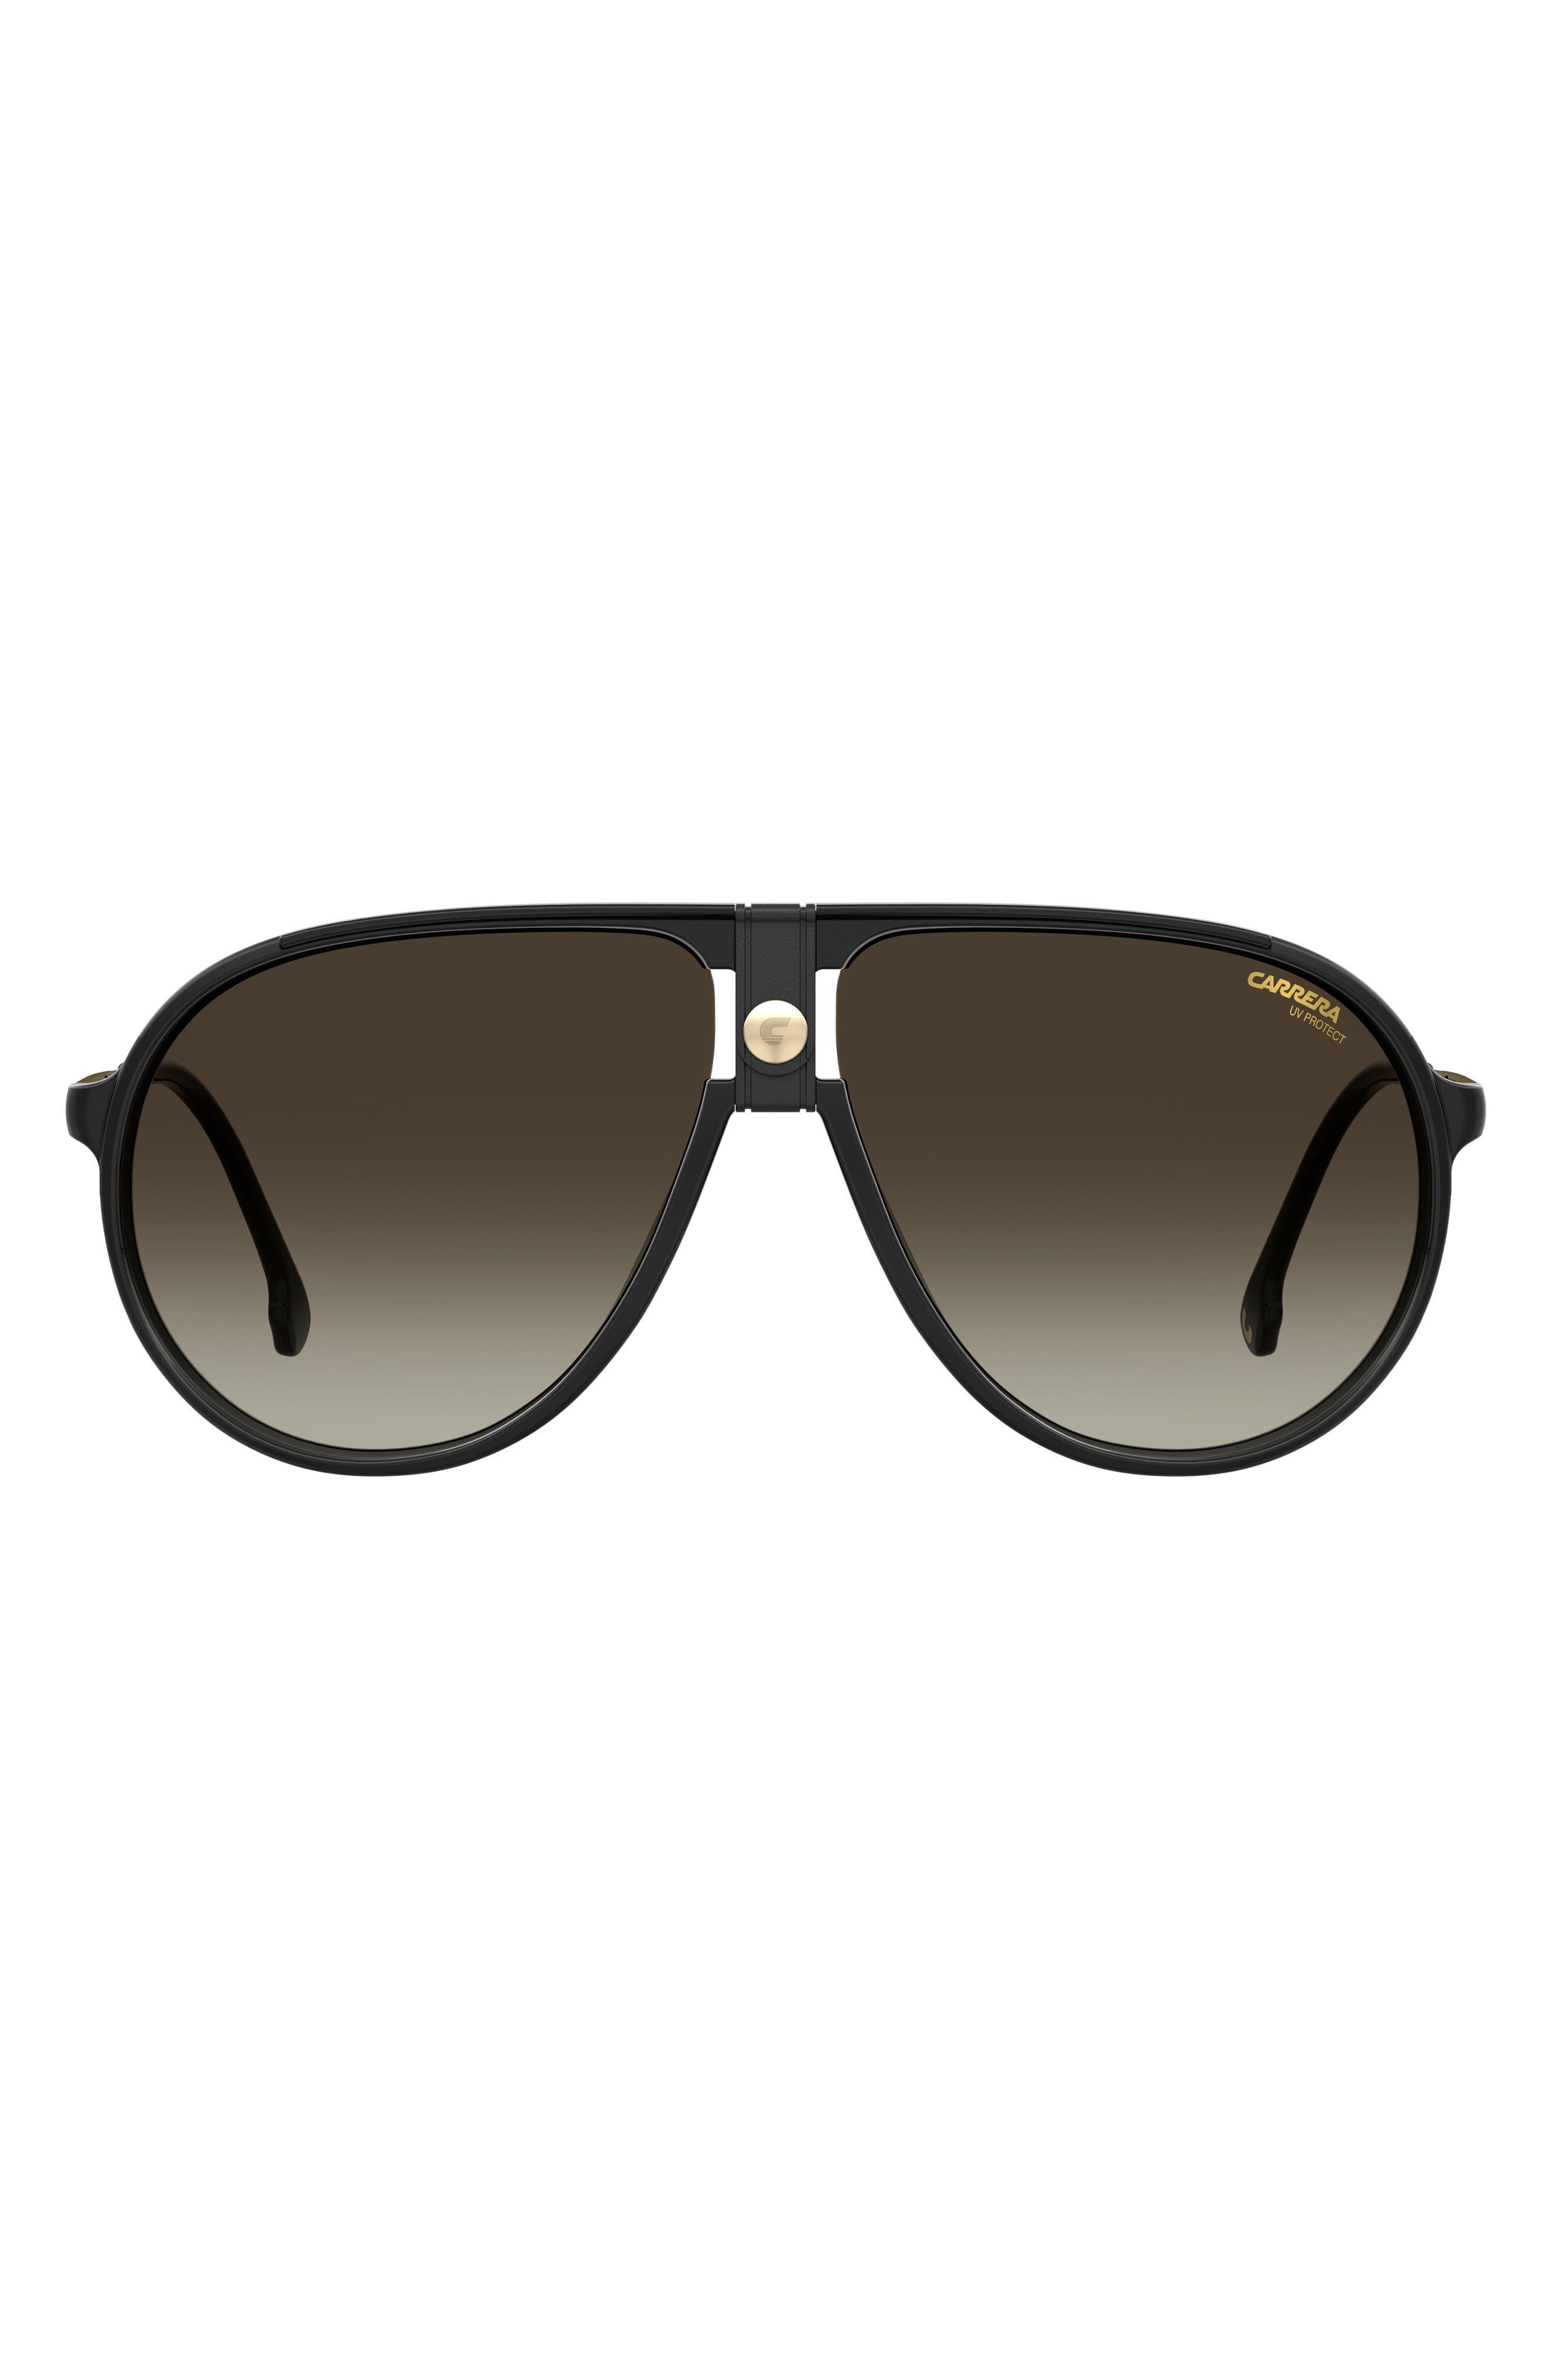 e Ca1034 63mm Oversize Gradient Sunglasses